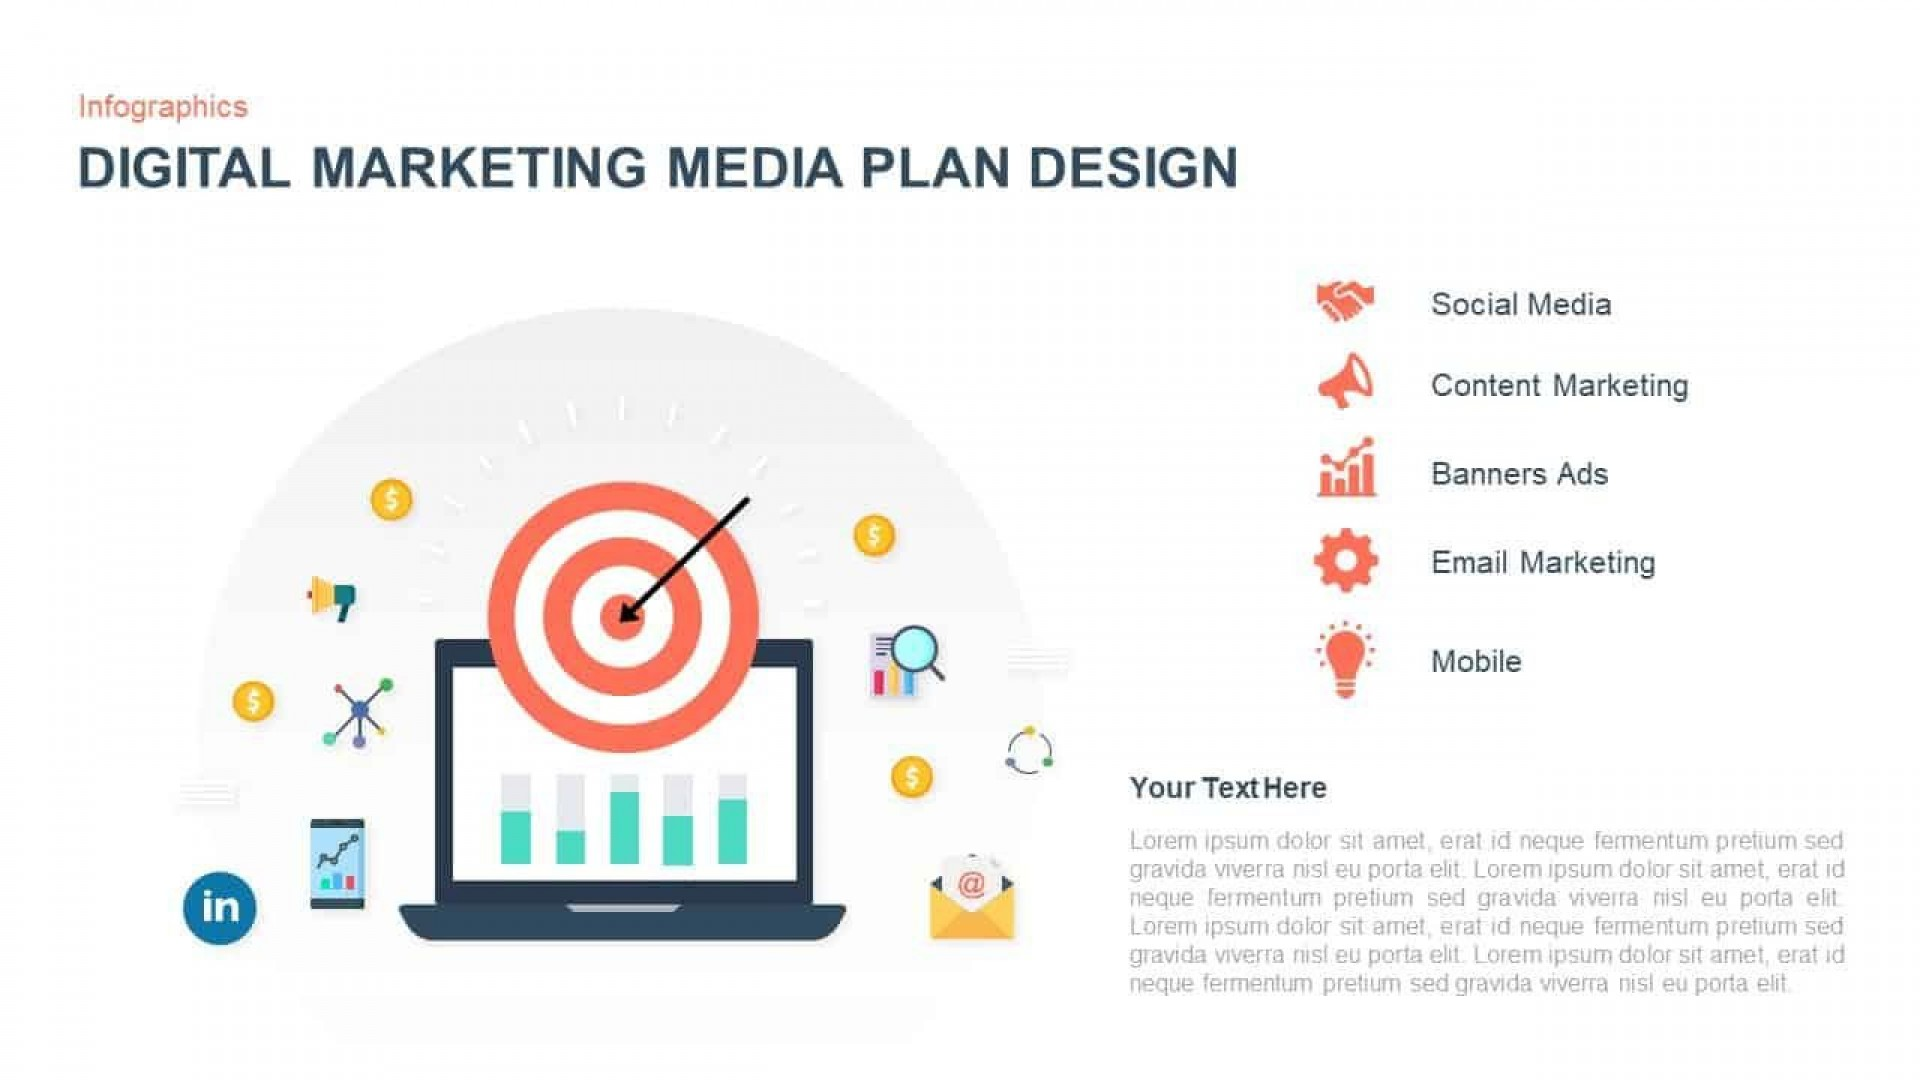 004 Excellent Digital Marketing Plan Ppt Presentation High Resolution 1920